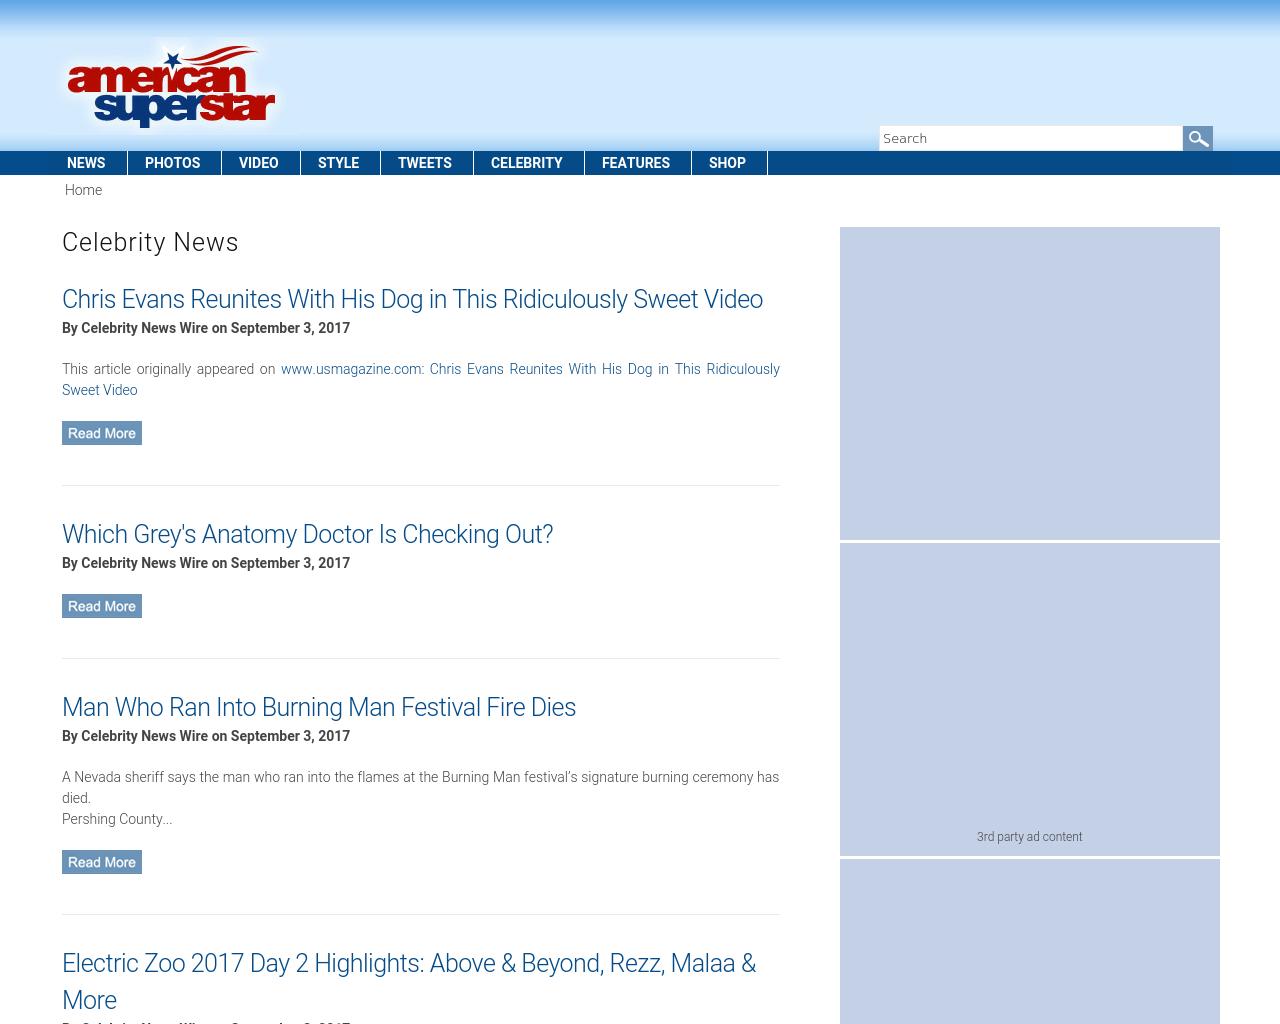 American-Superstar-Magazine-Advertising-Reviews-Pricing